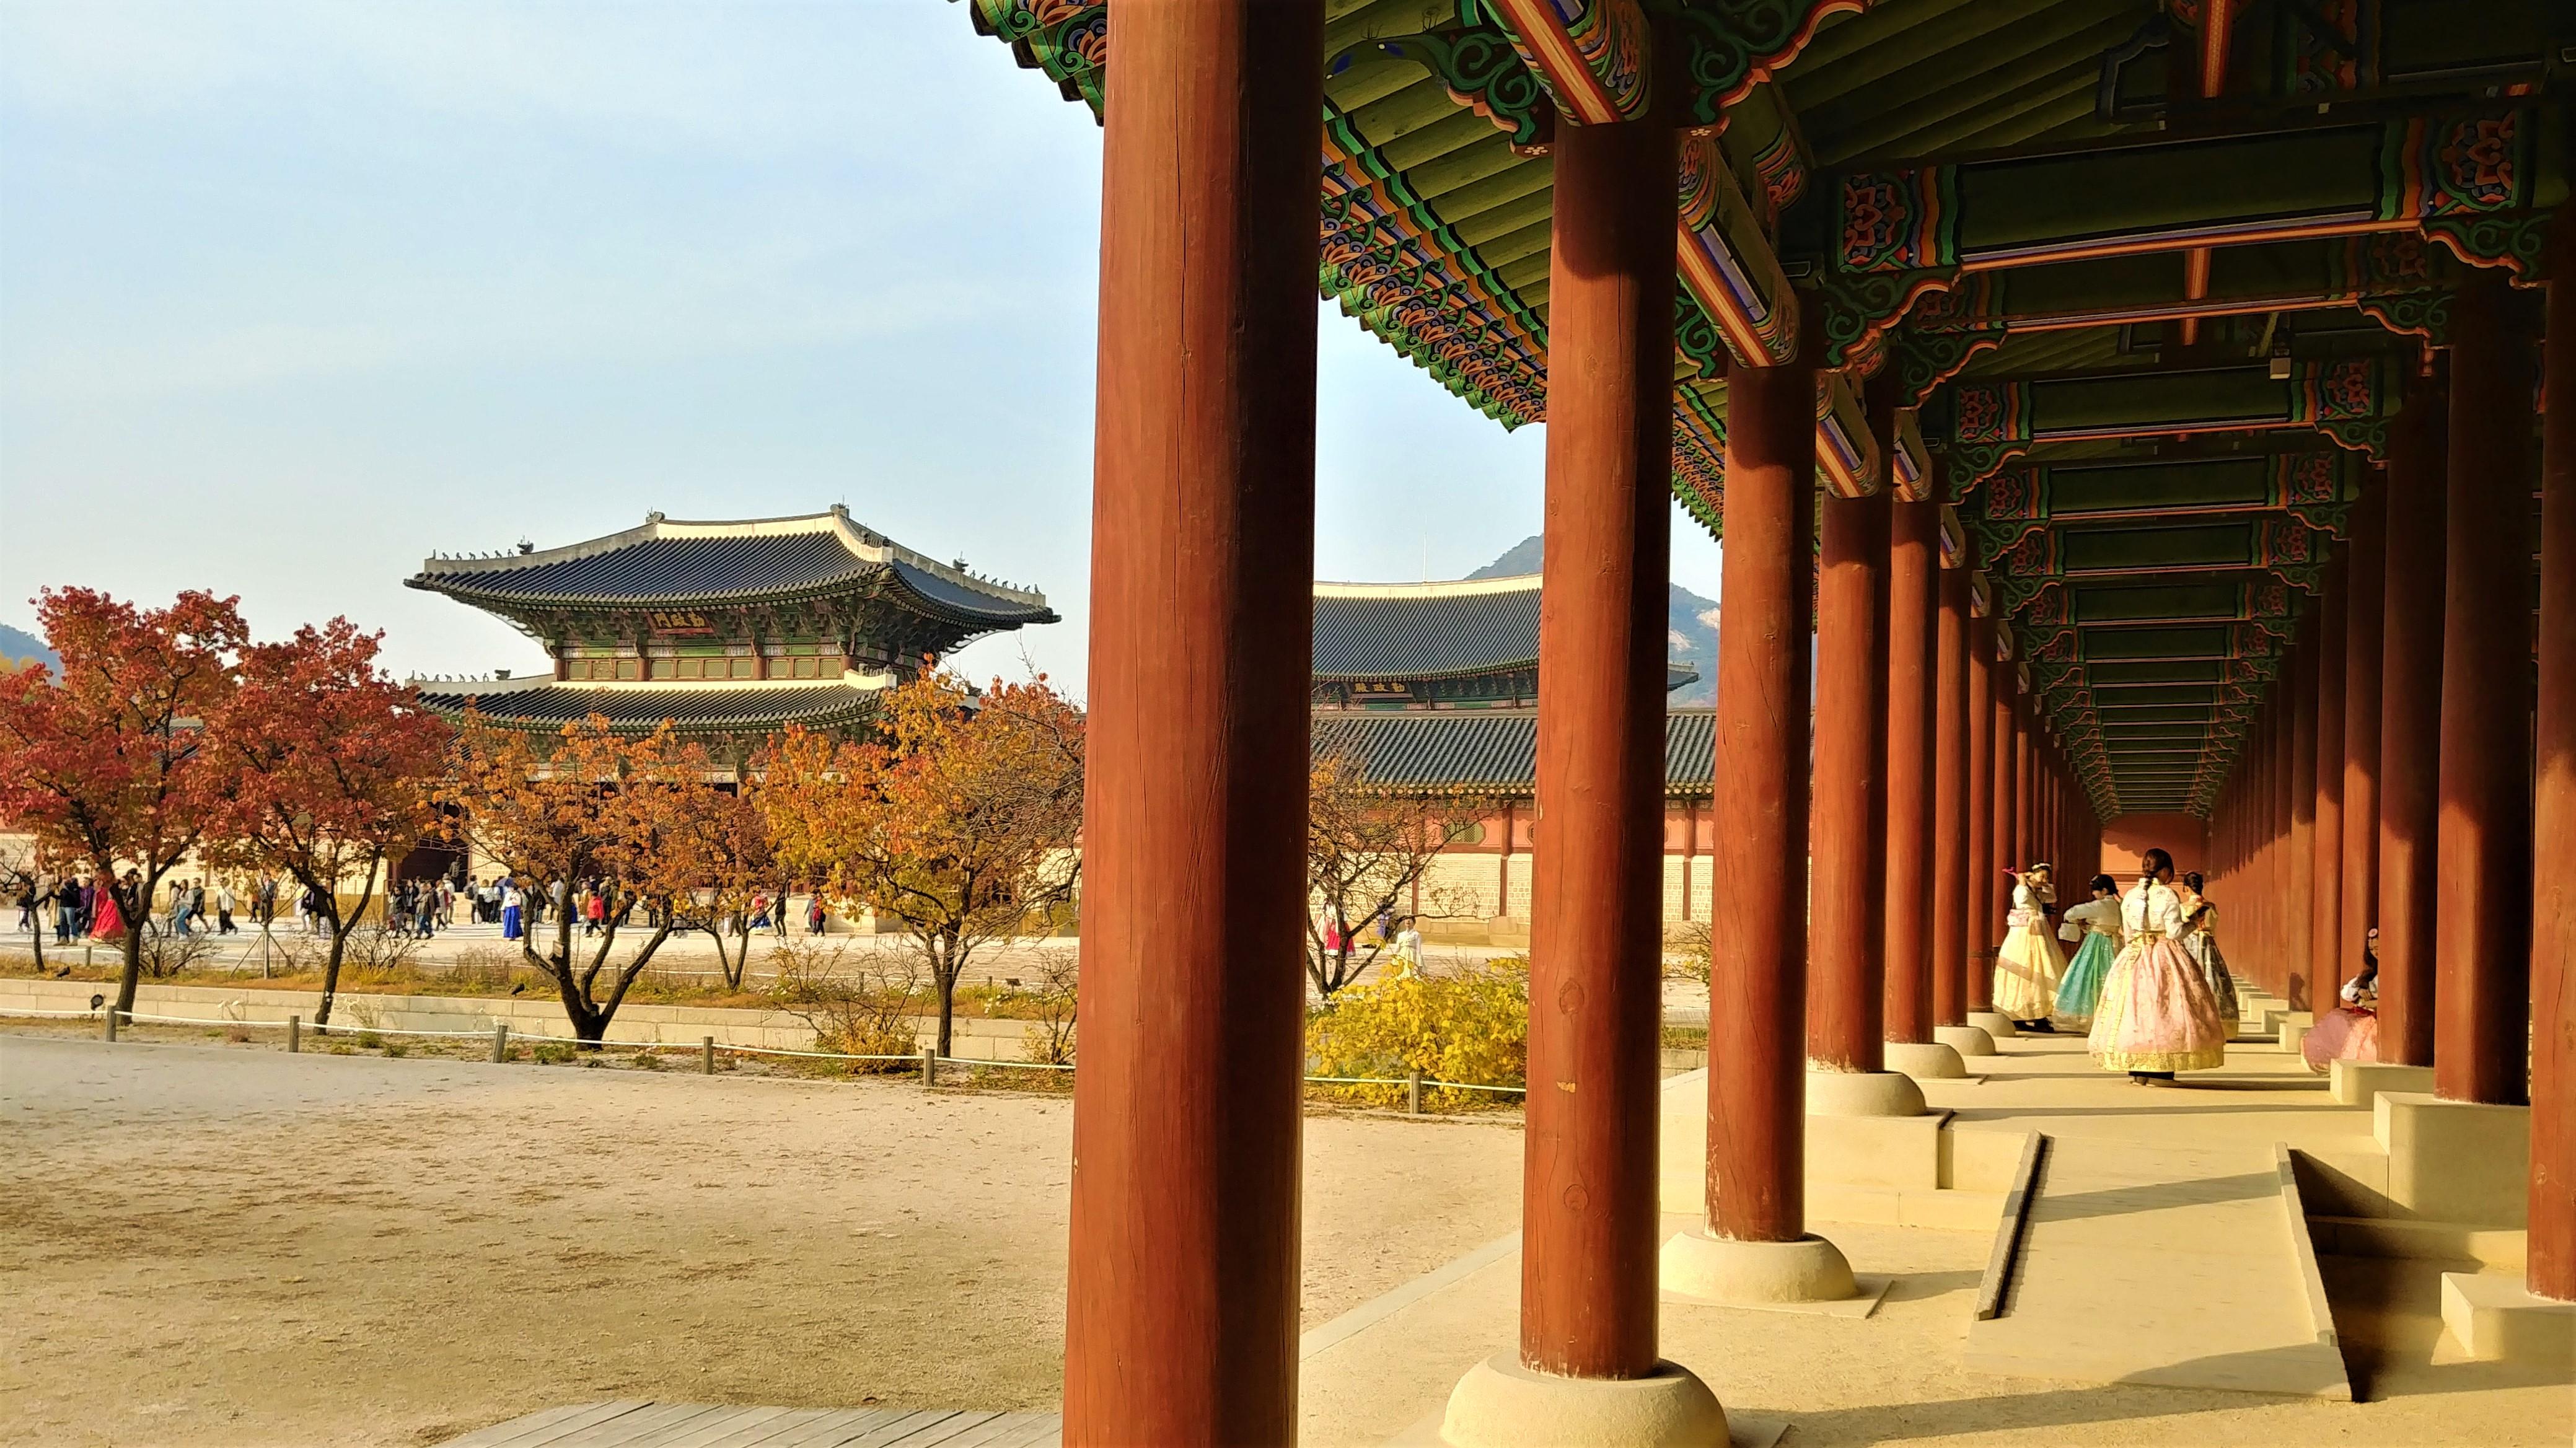 seoul Gyeongbokgung palais royal que faire coree blog voyage asie arpenter le chemin